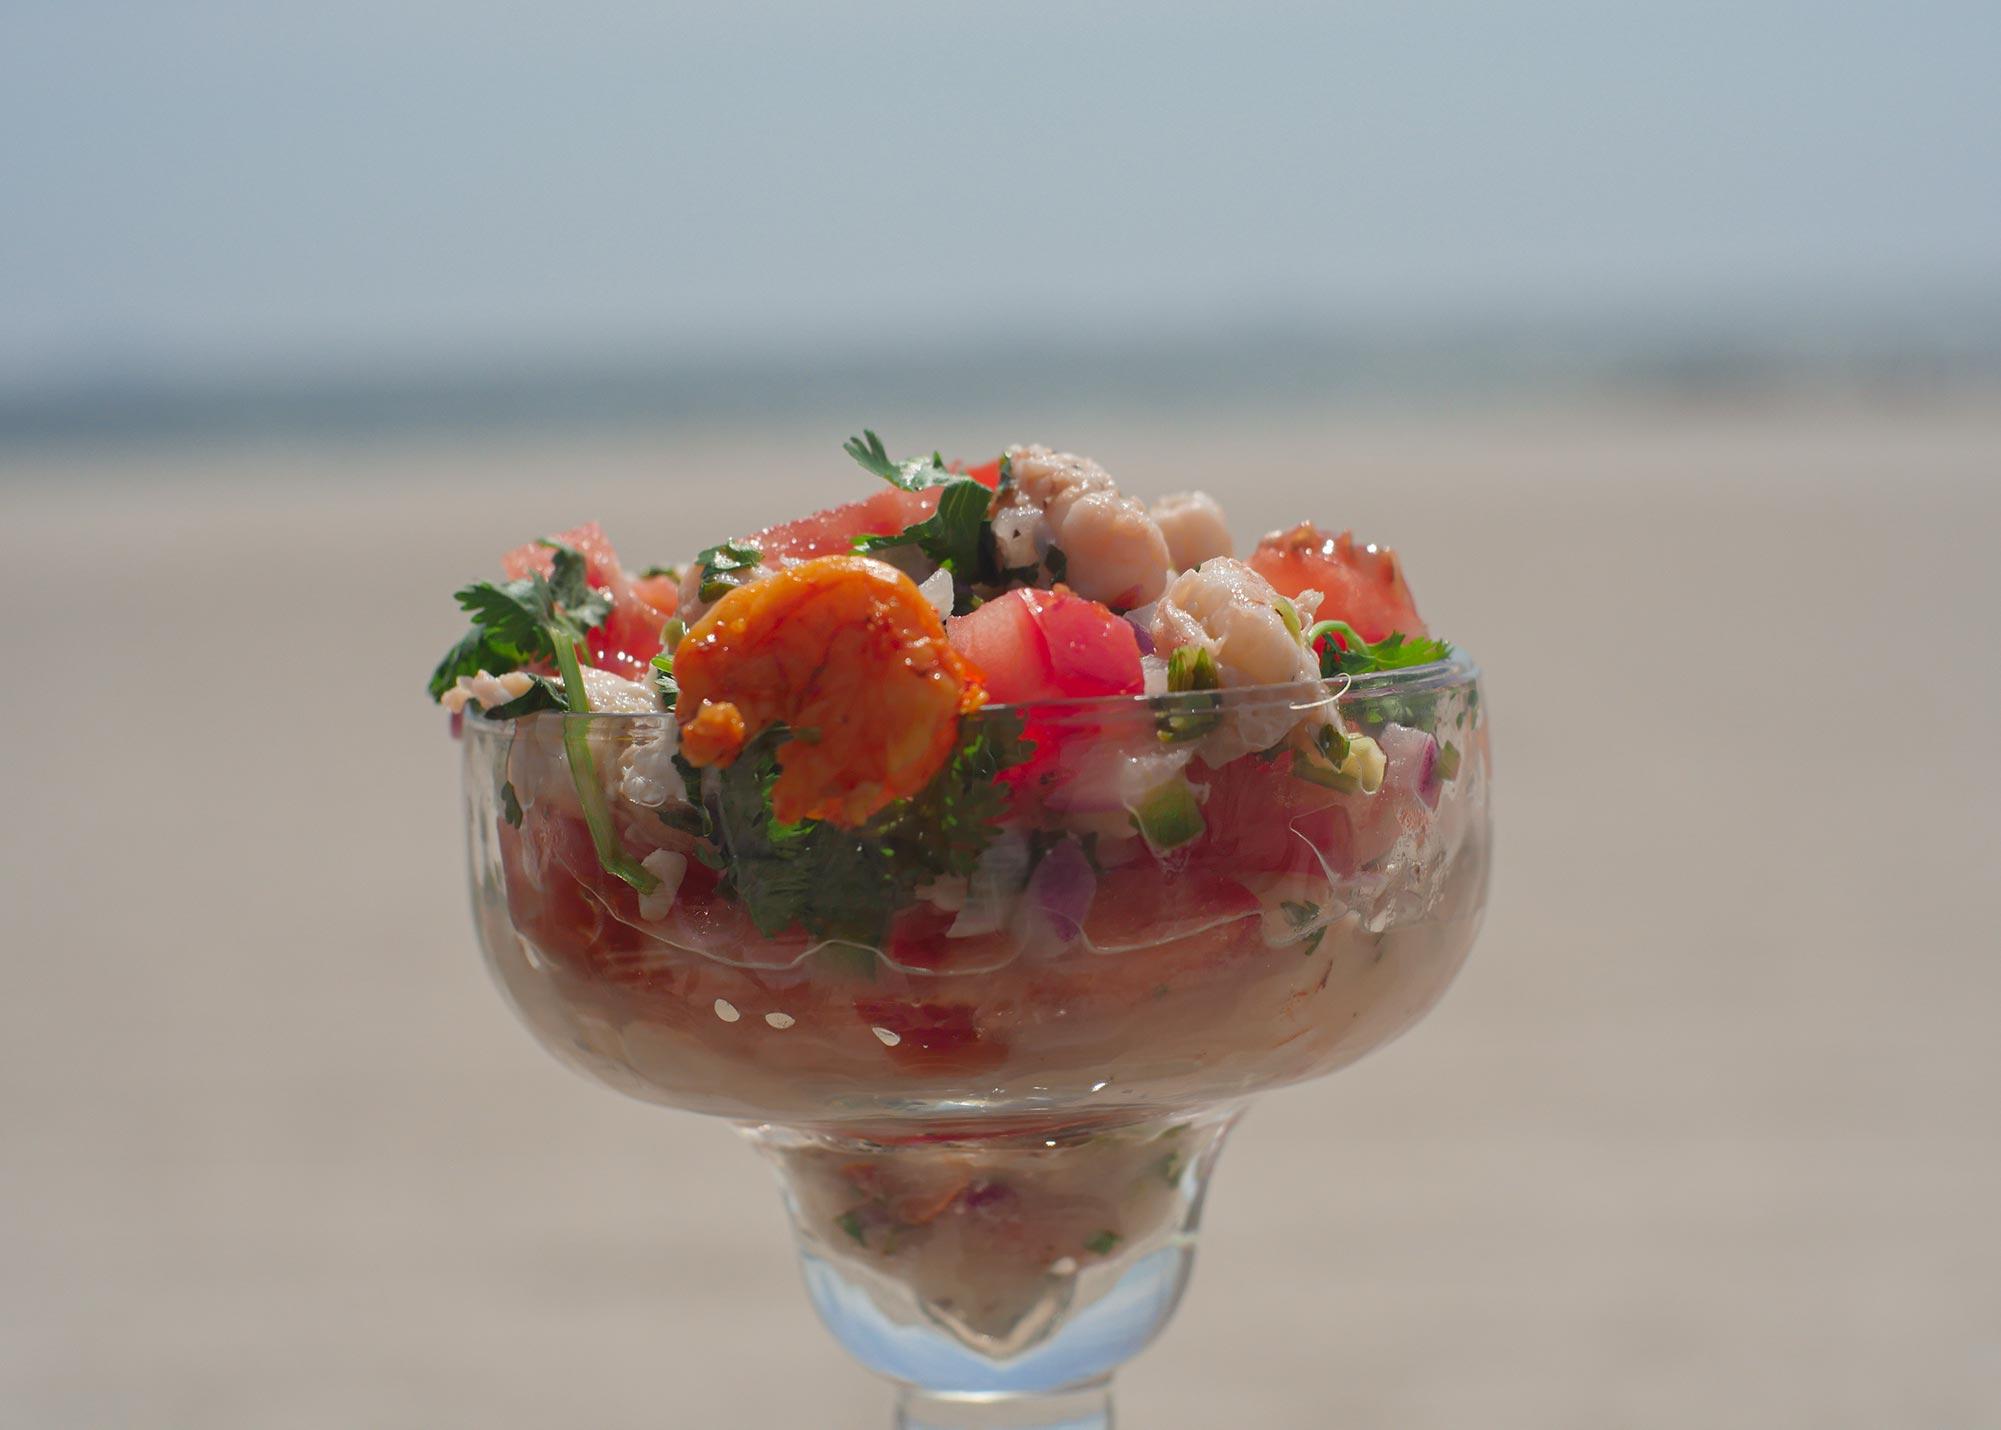 foodrockett menu Ceviche Shrimp 2